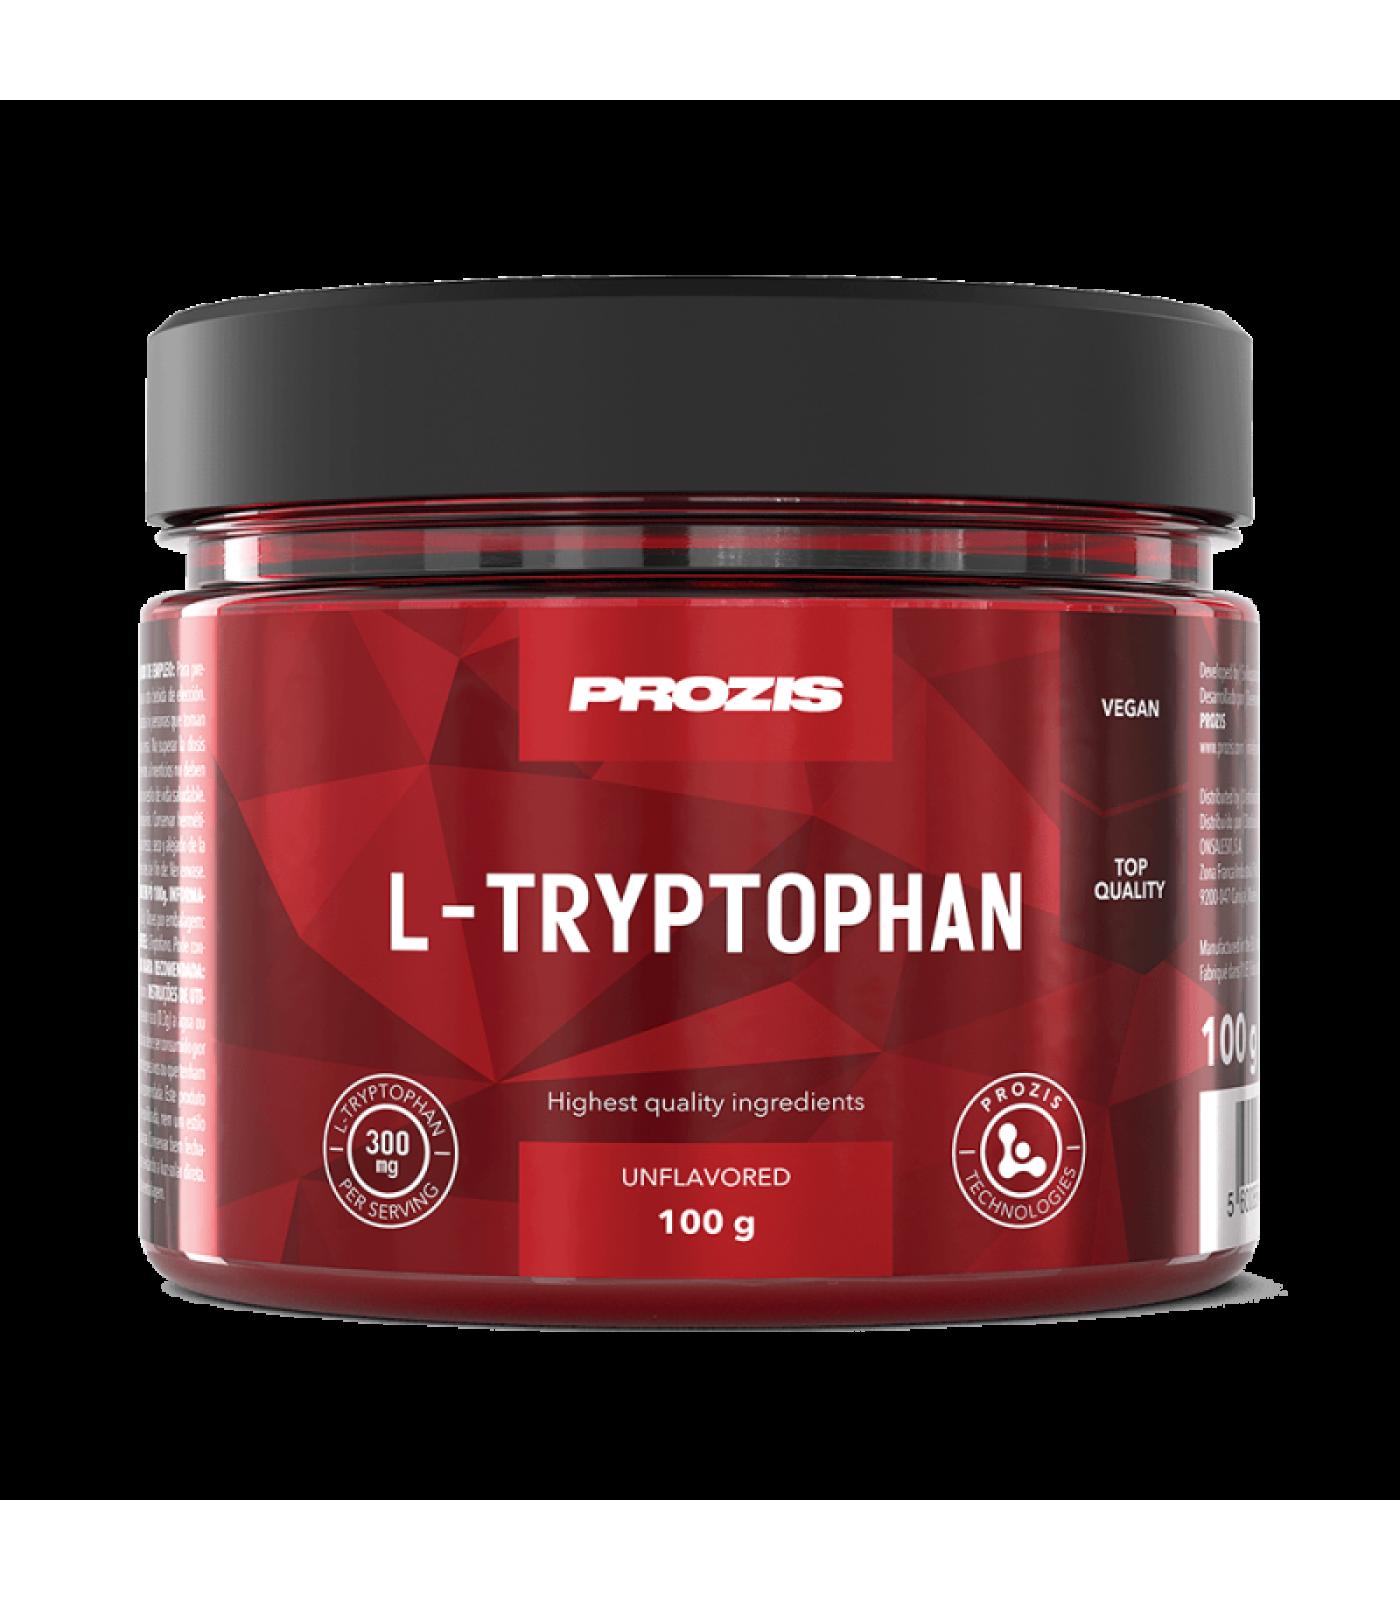 Prozis L-Tryptophan / 100g.